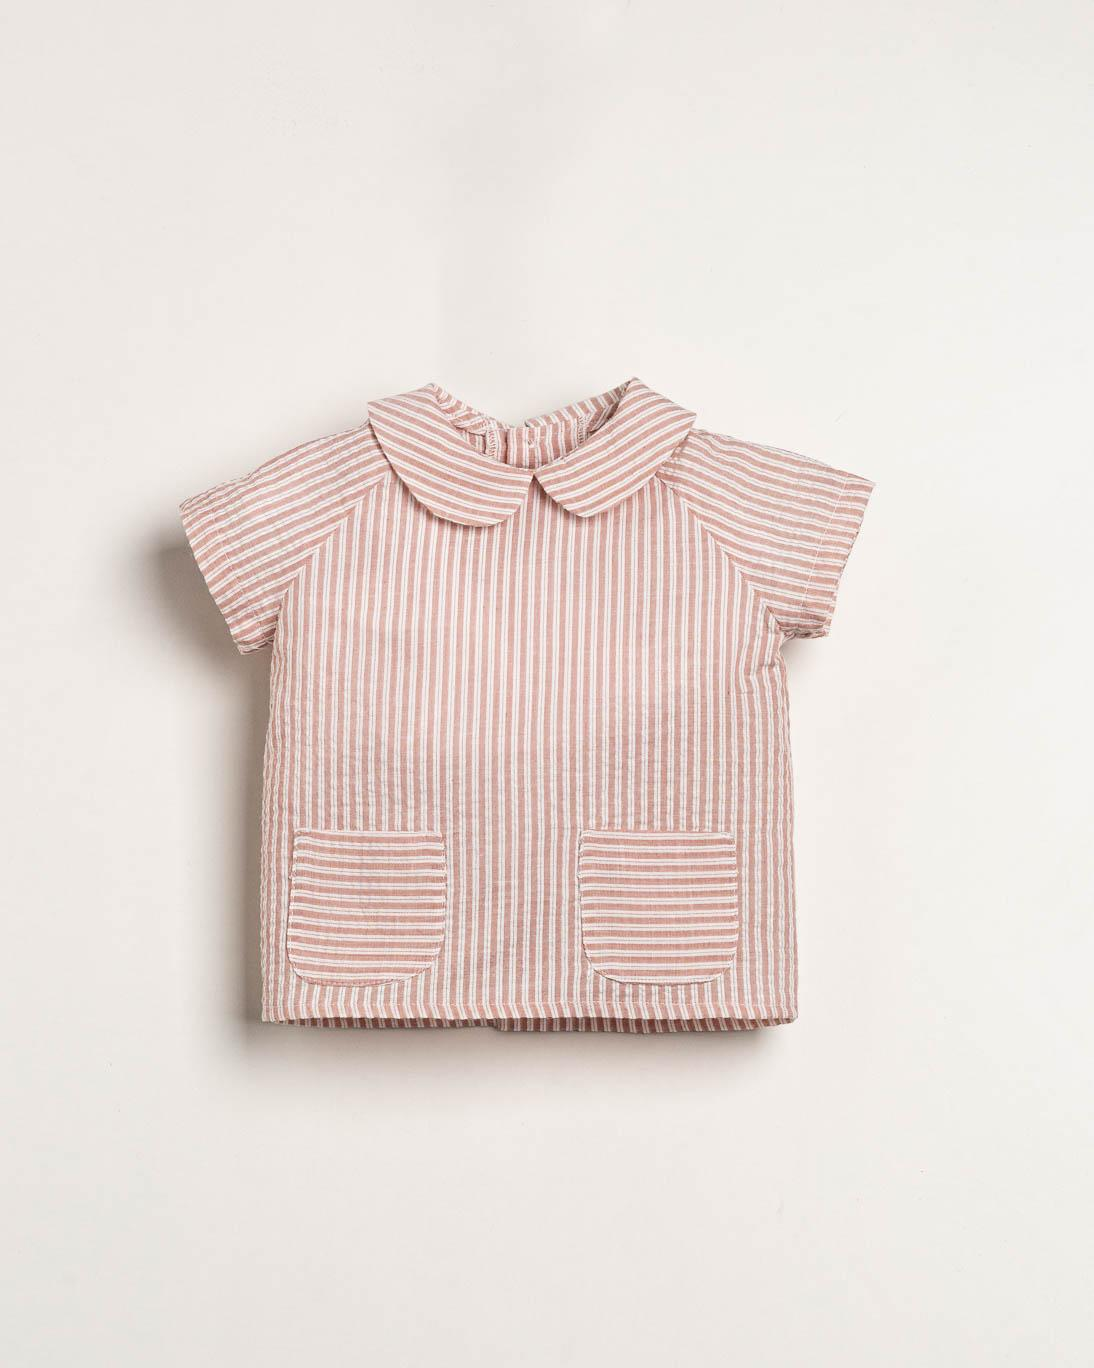 Camisa Ancar rayas seersucker color rosa.